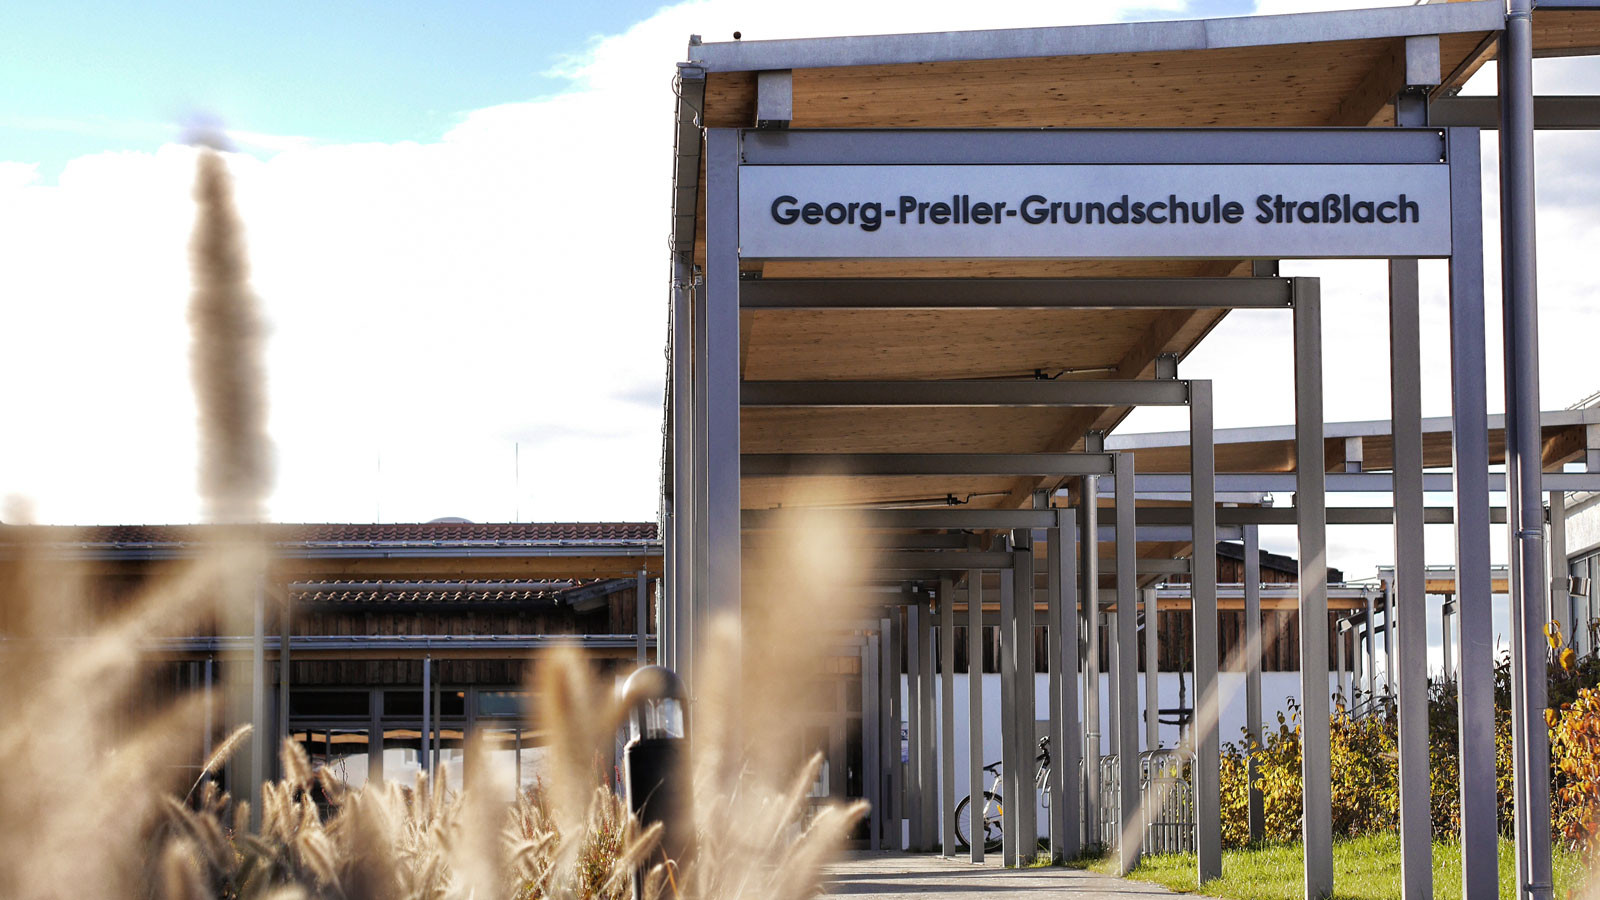 Georg-Preller-Grundschule